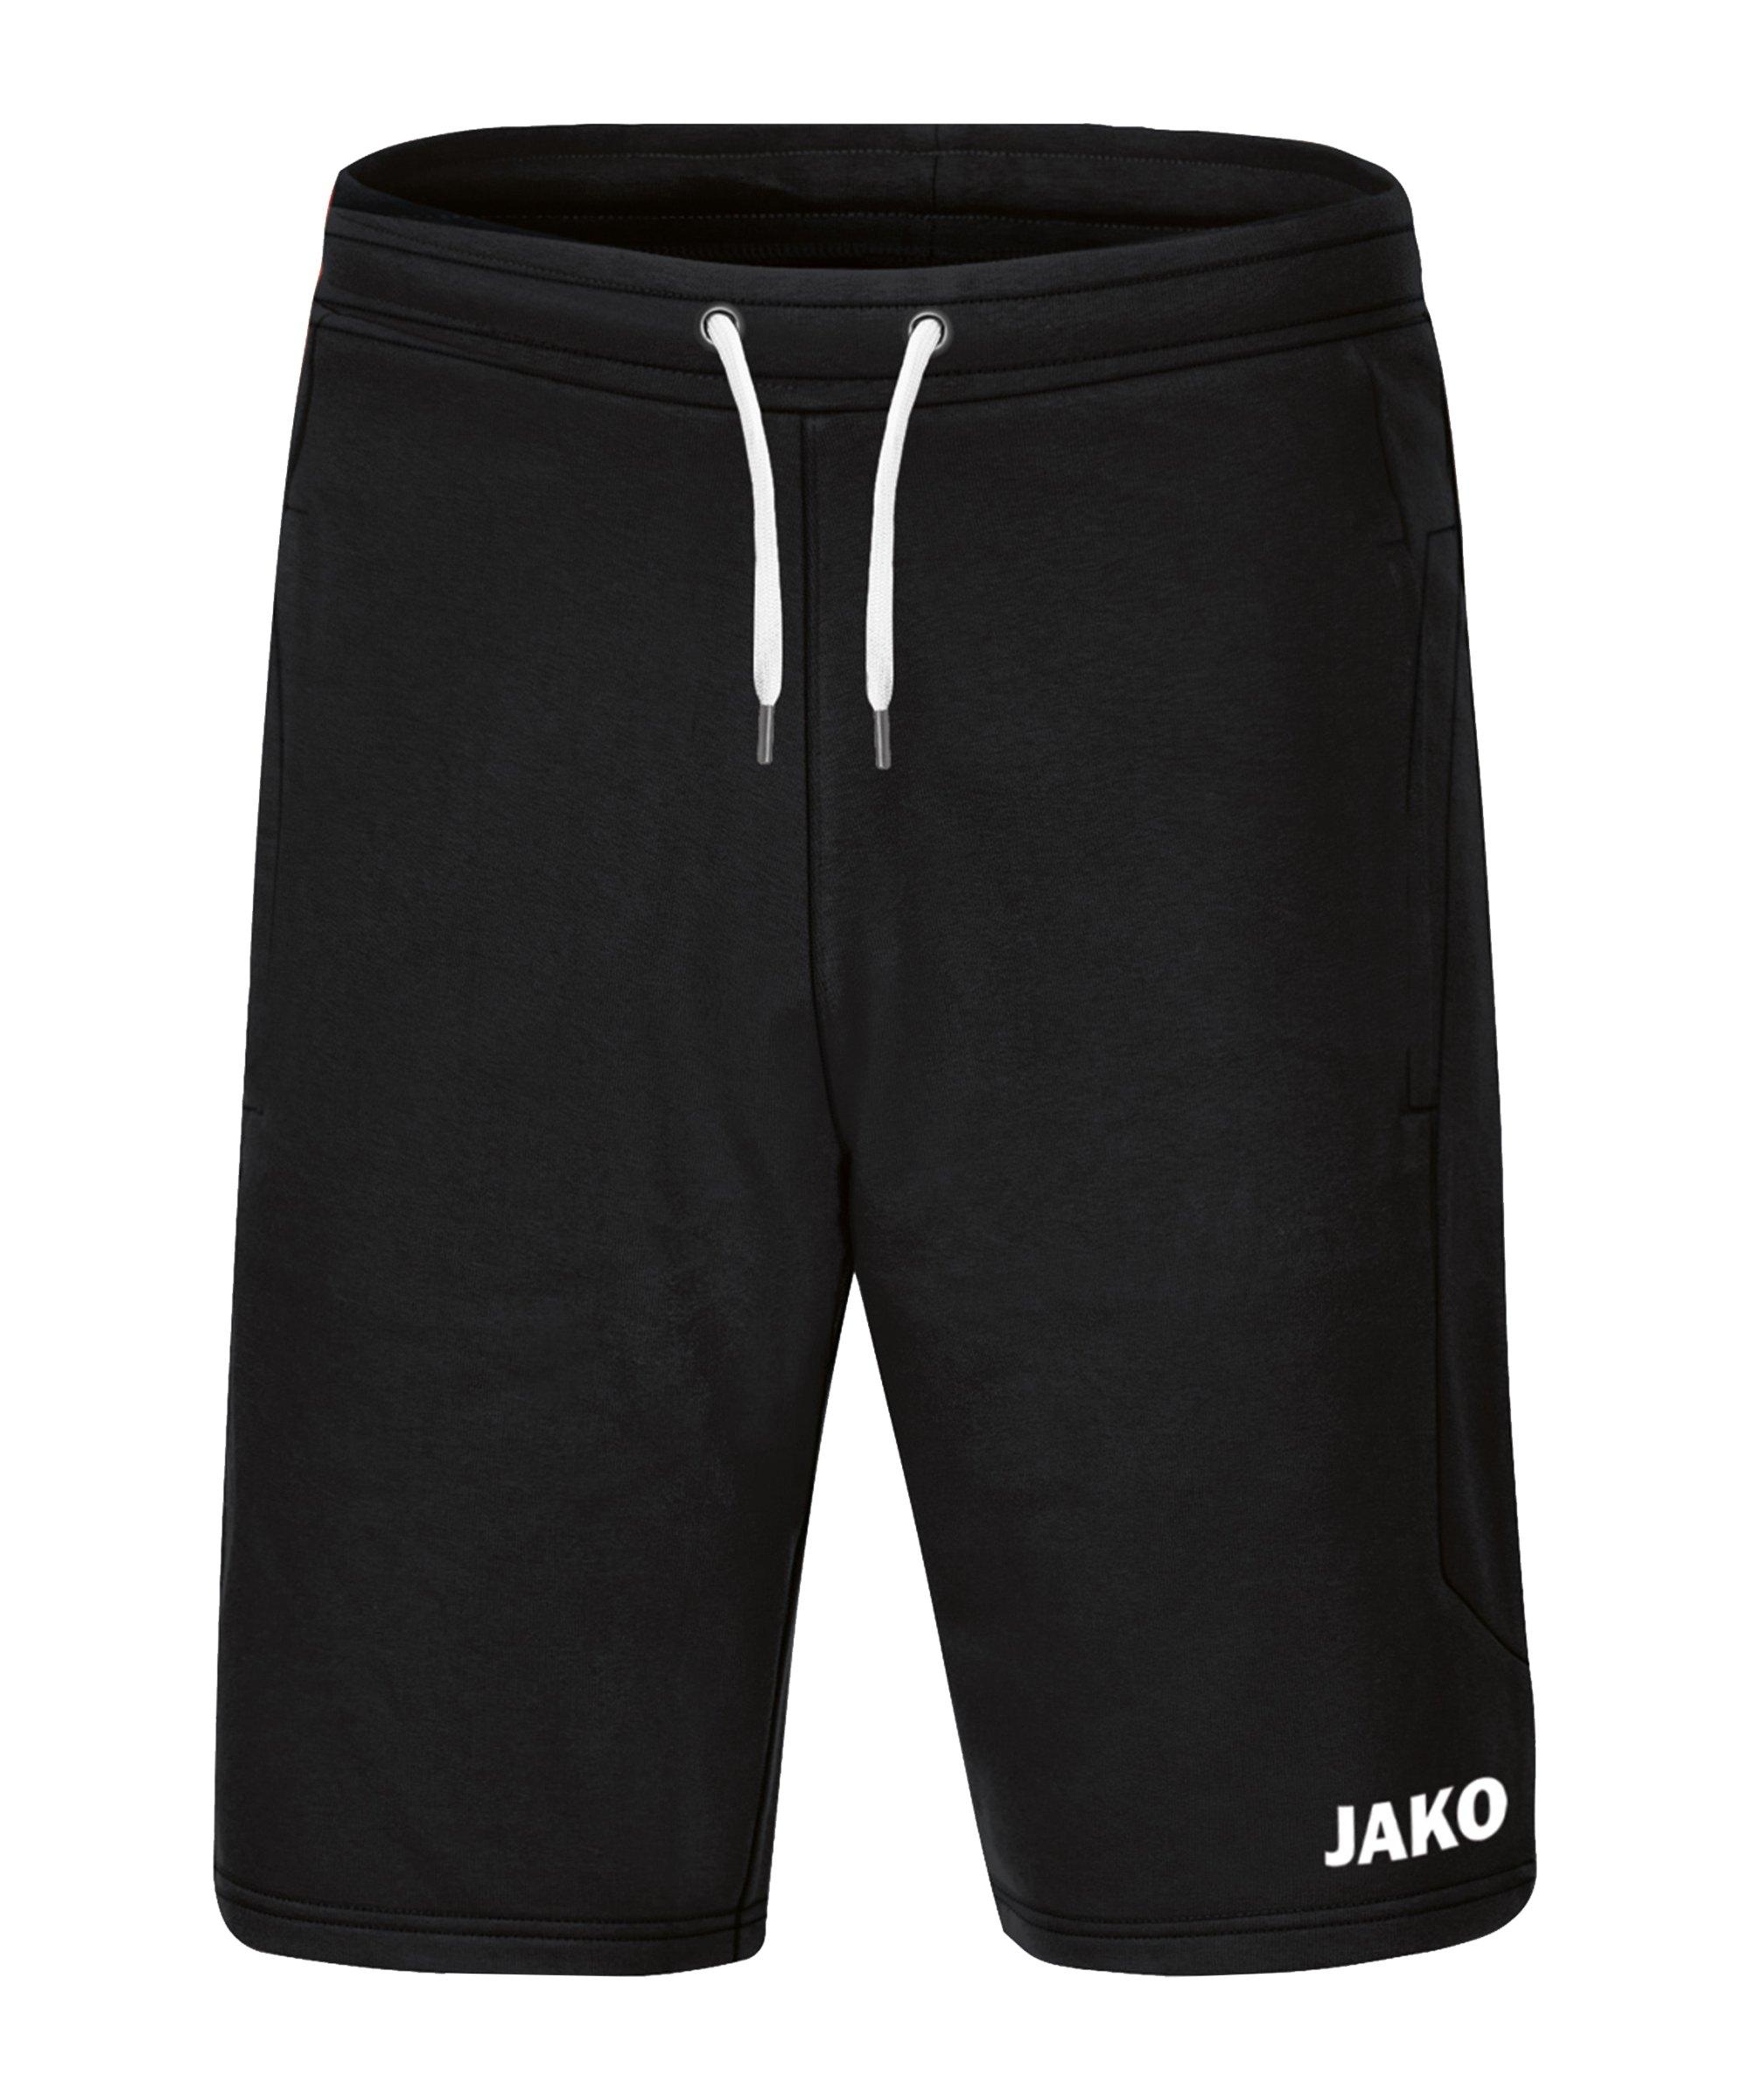 JAKO Base Short Schwarz F08 - schwarz